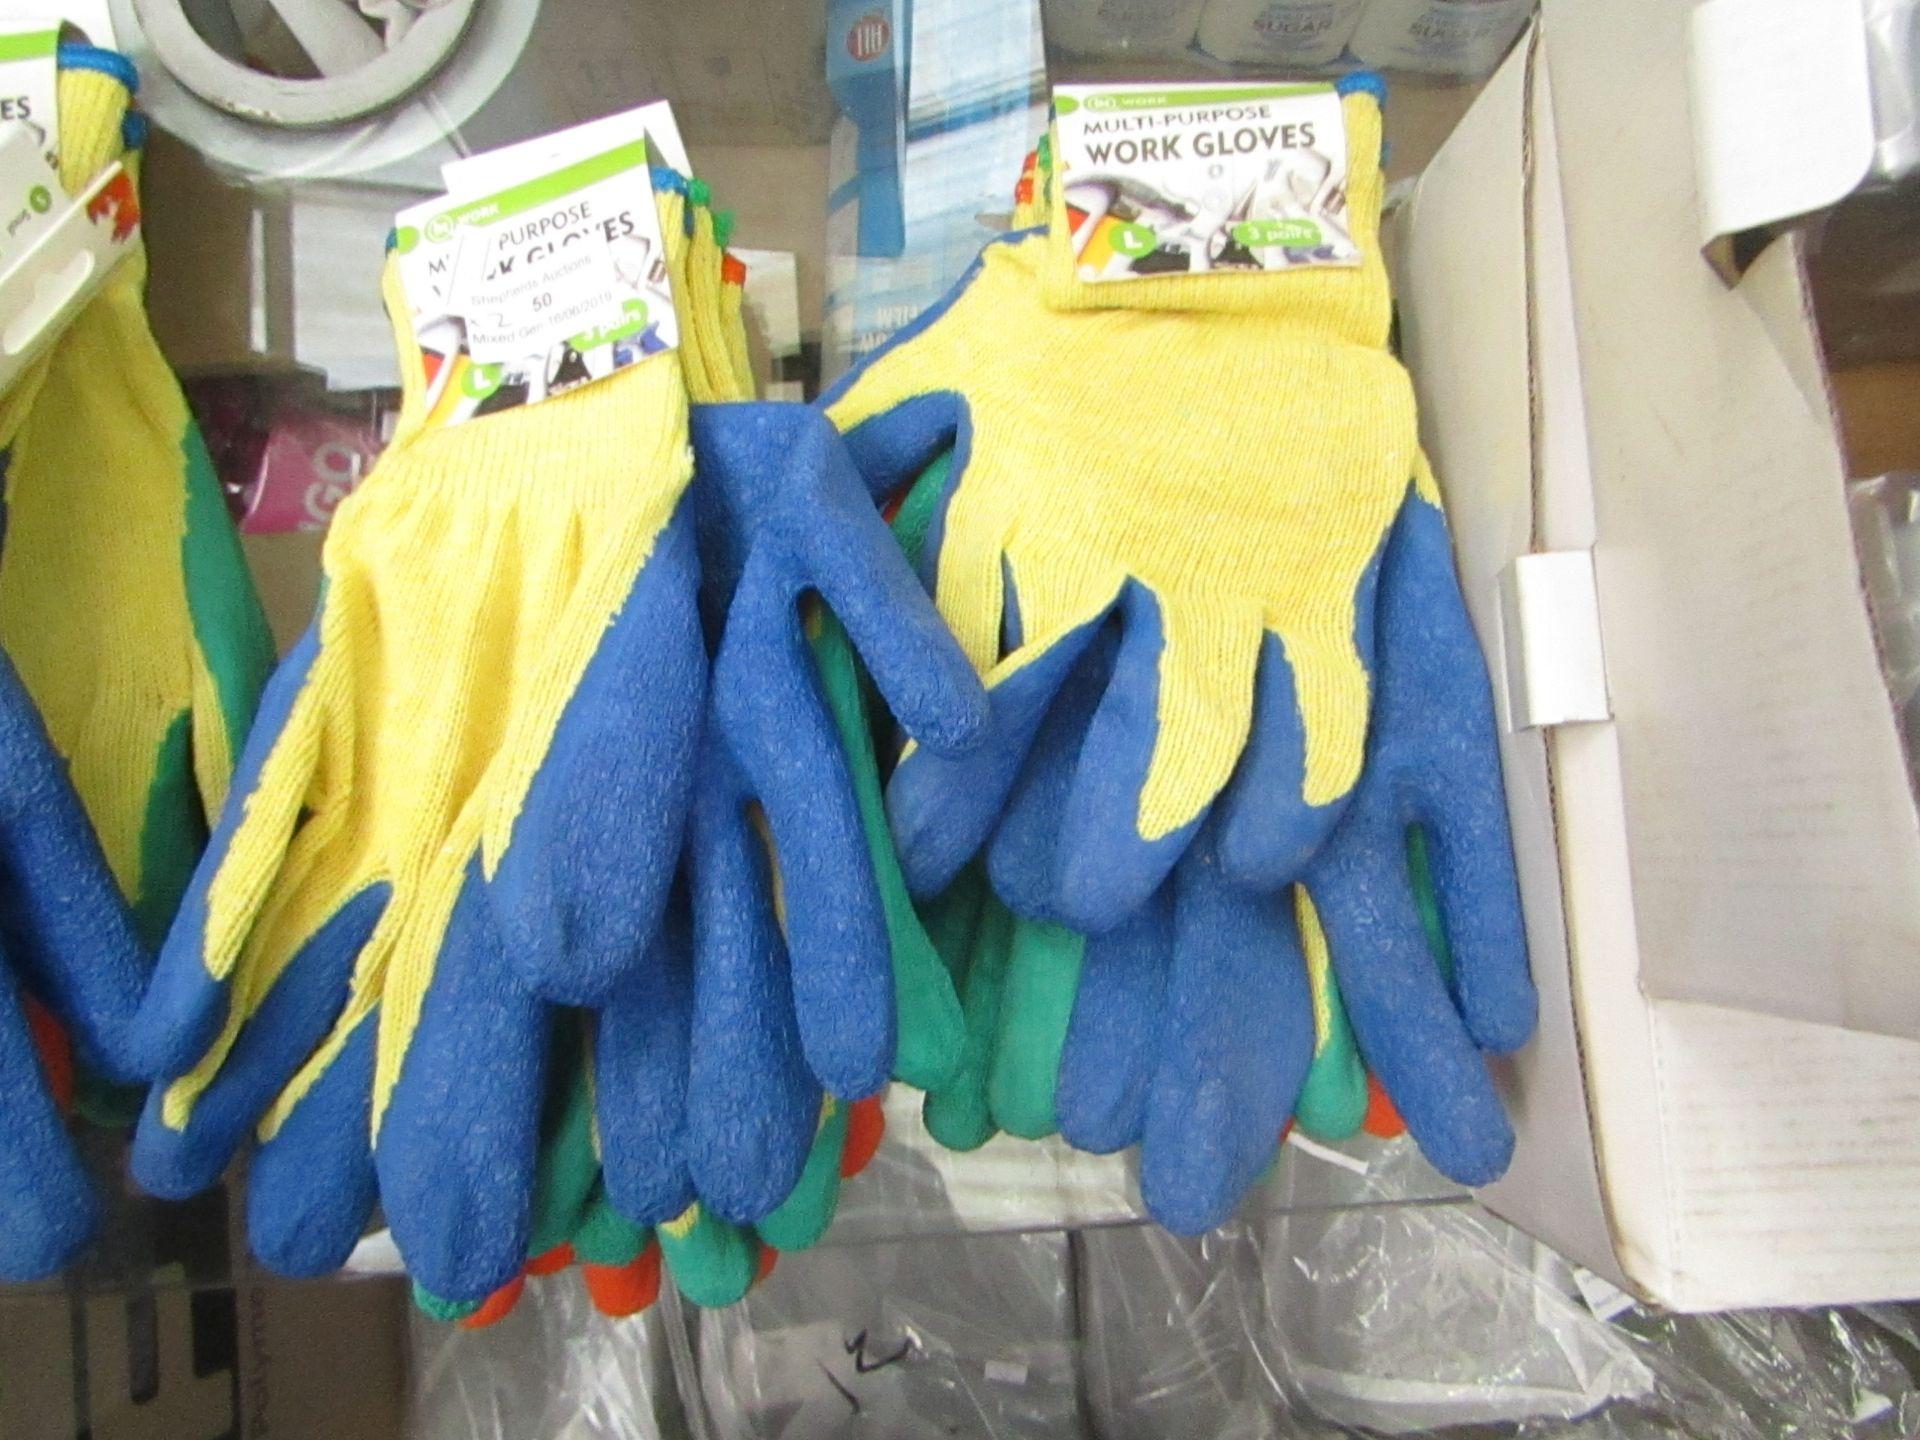 Lot 50 - 2 x packs of 3 Multi Purpose work gloves, new in packaging